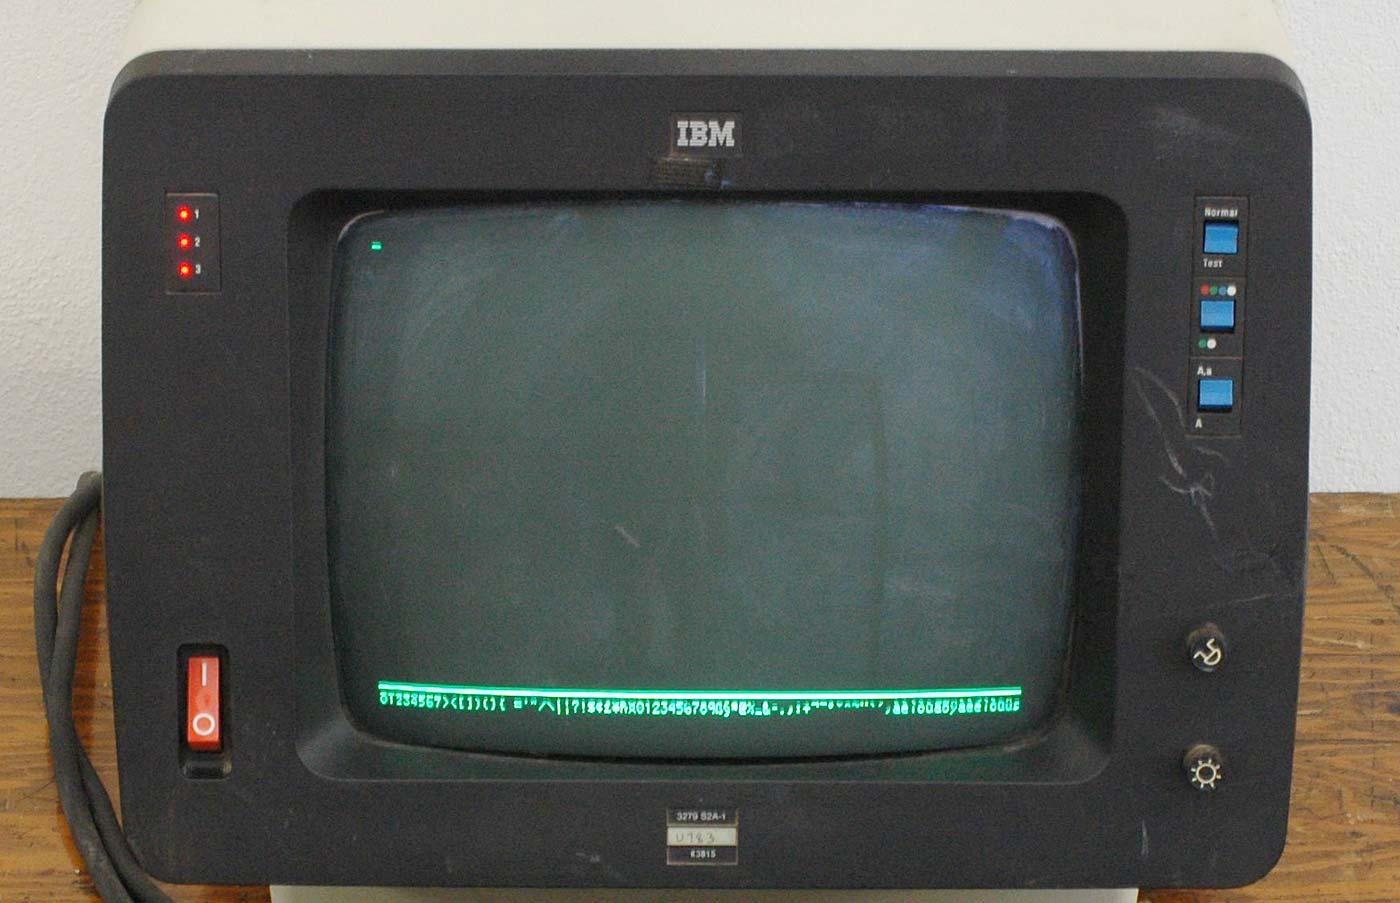 IBM 3279